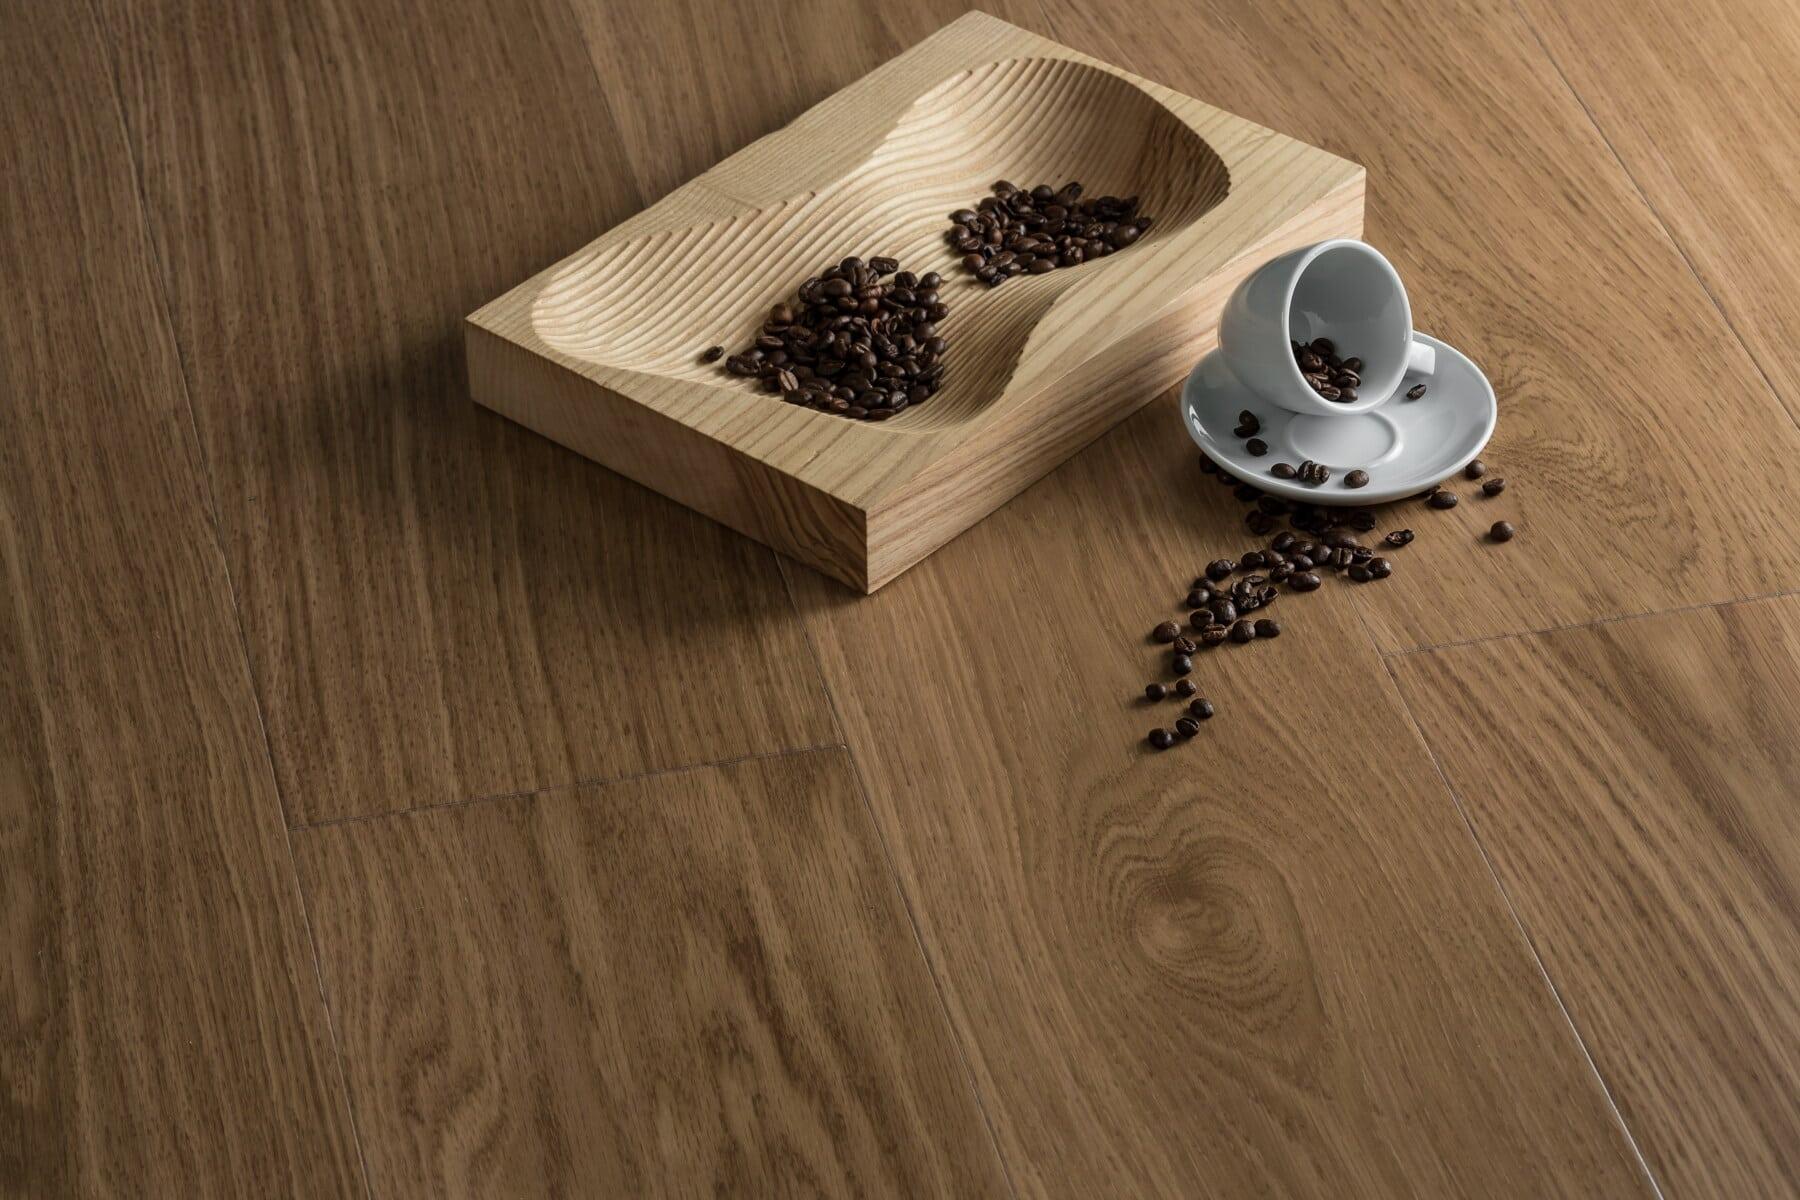 aromatic, caffeine, seed, dark, coffee, roast, coffee mug, wood, wooden, retro